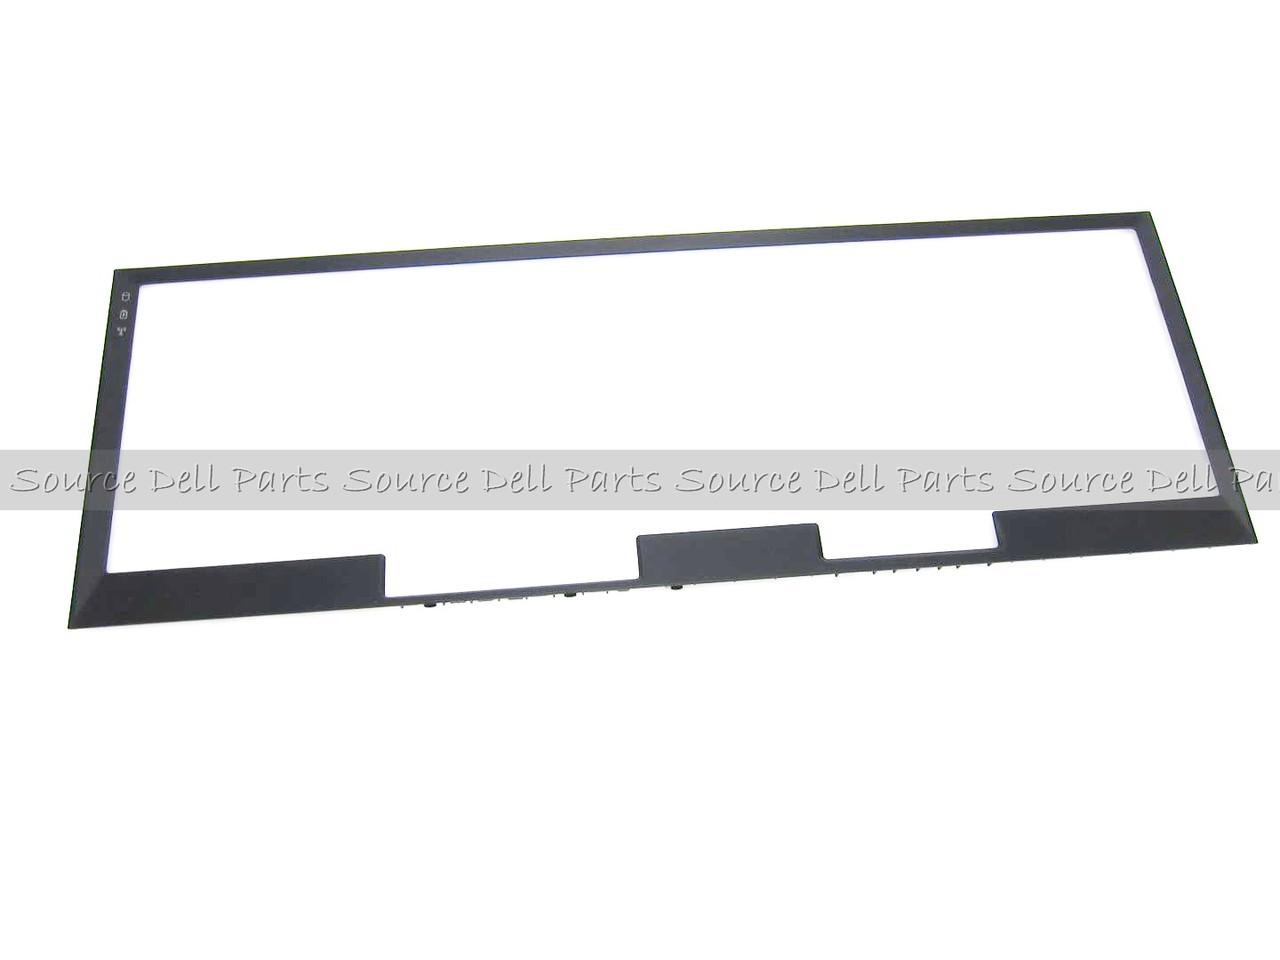 Dell Latitude E5520 Dual Pointing Keyboard Bezel Trim Overlay - DWJ9G